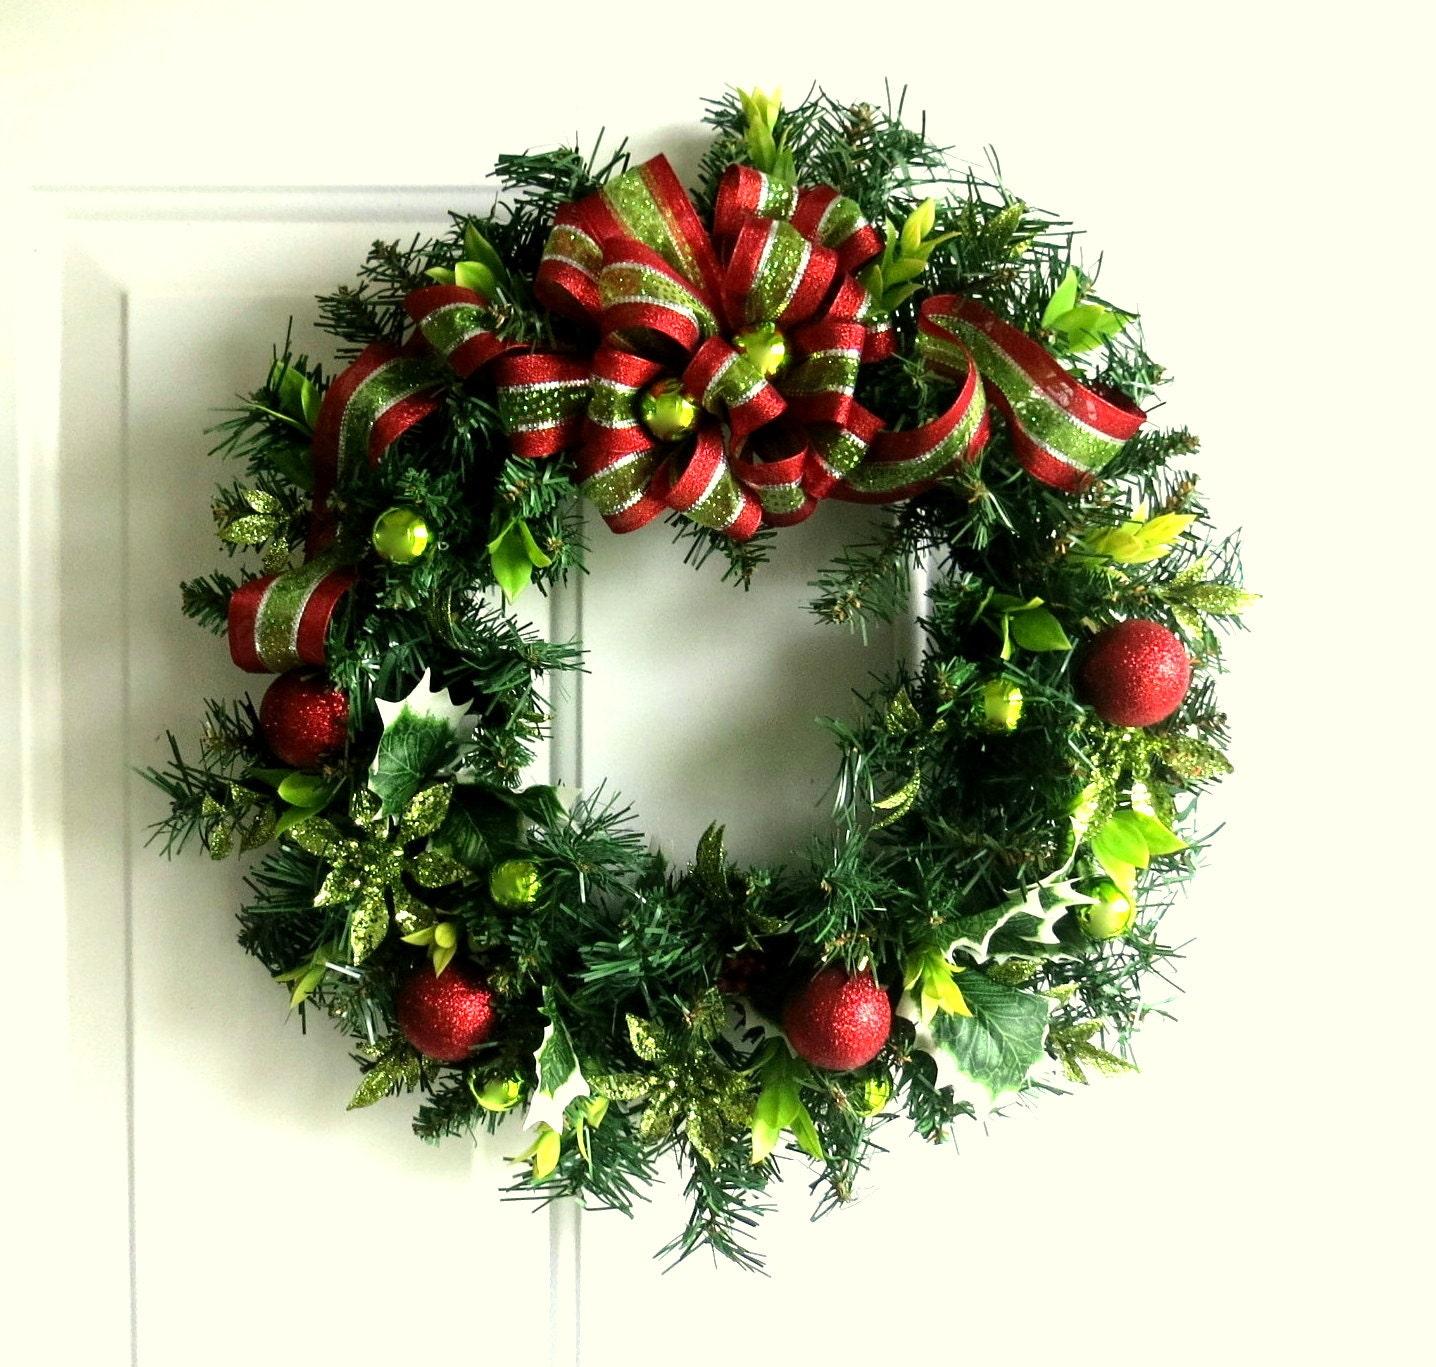 Christmas Wreath Lime Green And Red Christmas Wreath